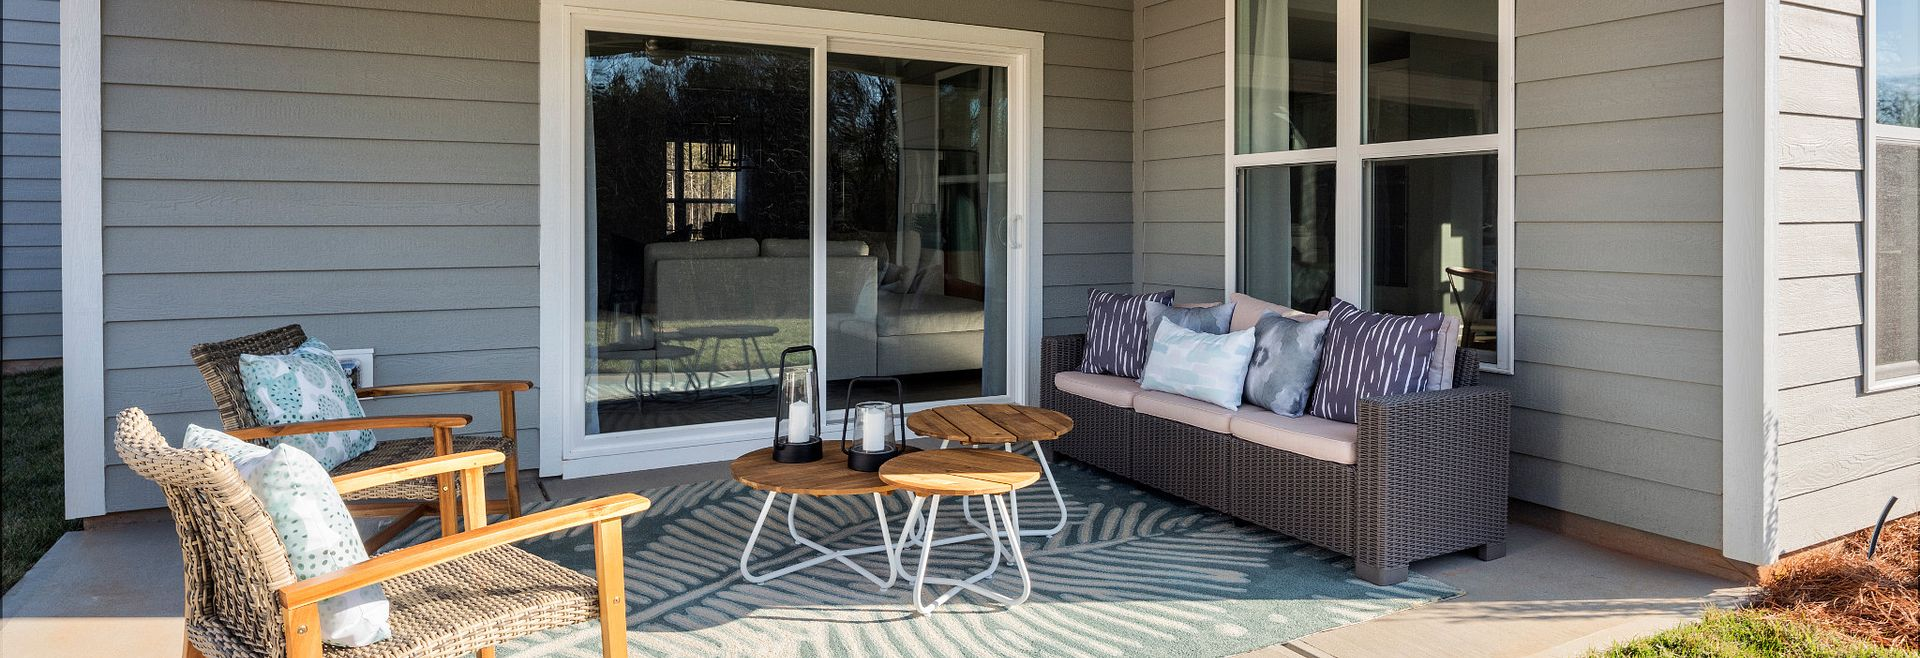 Cambridge Model Home Porch